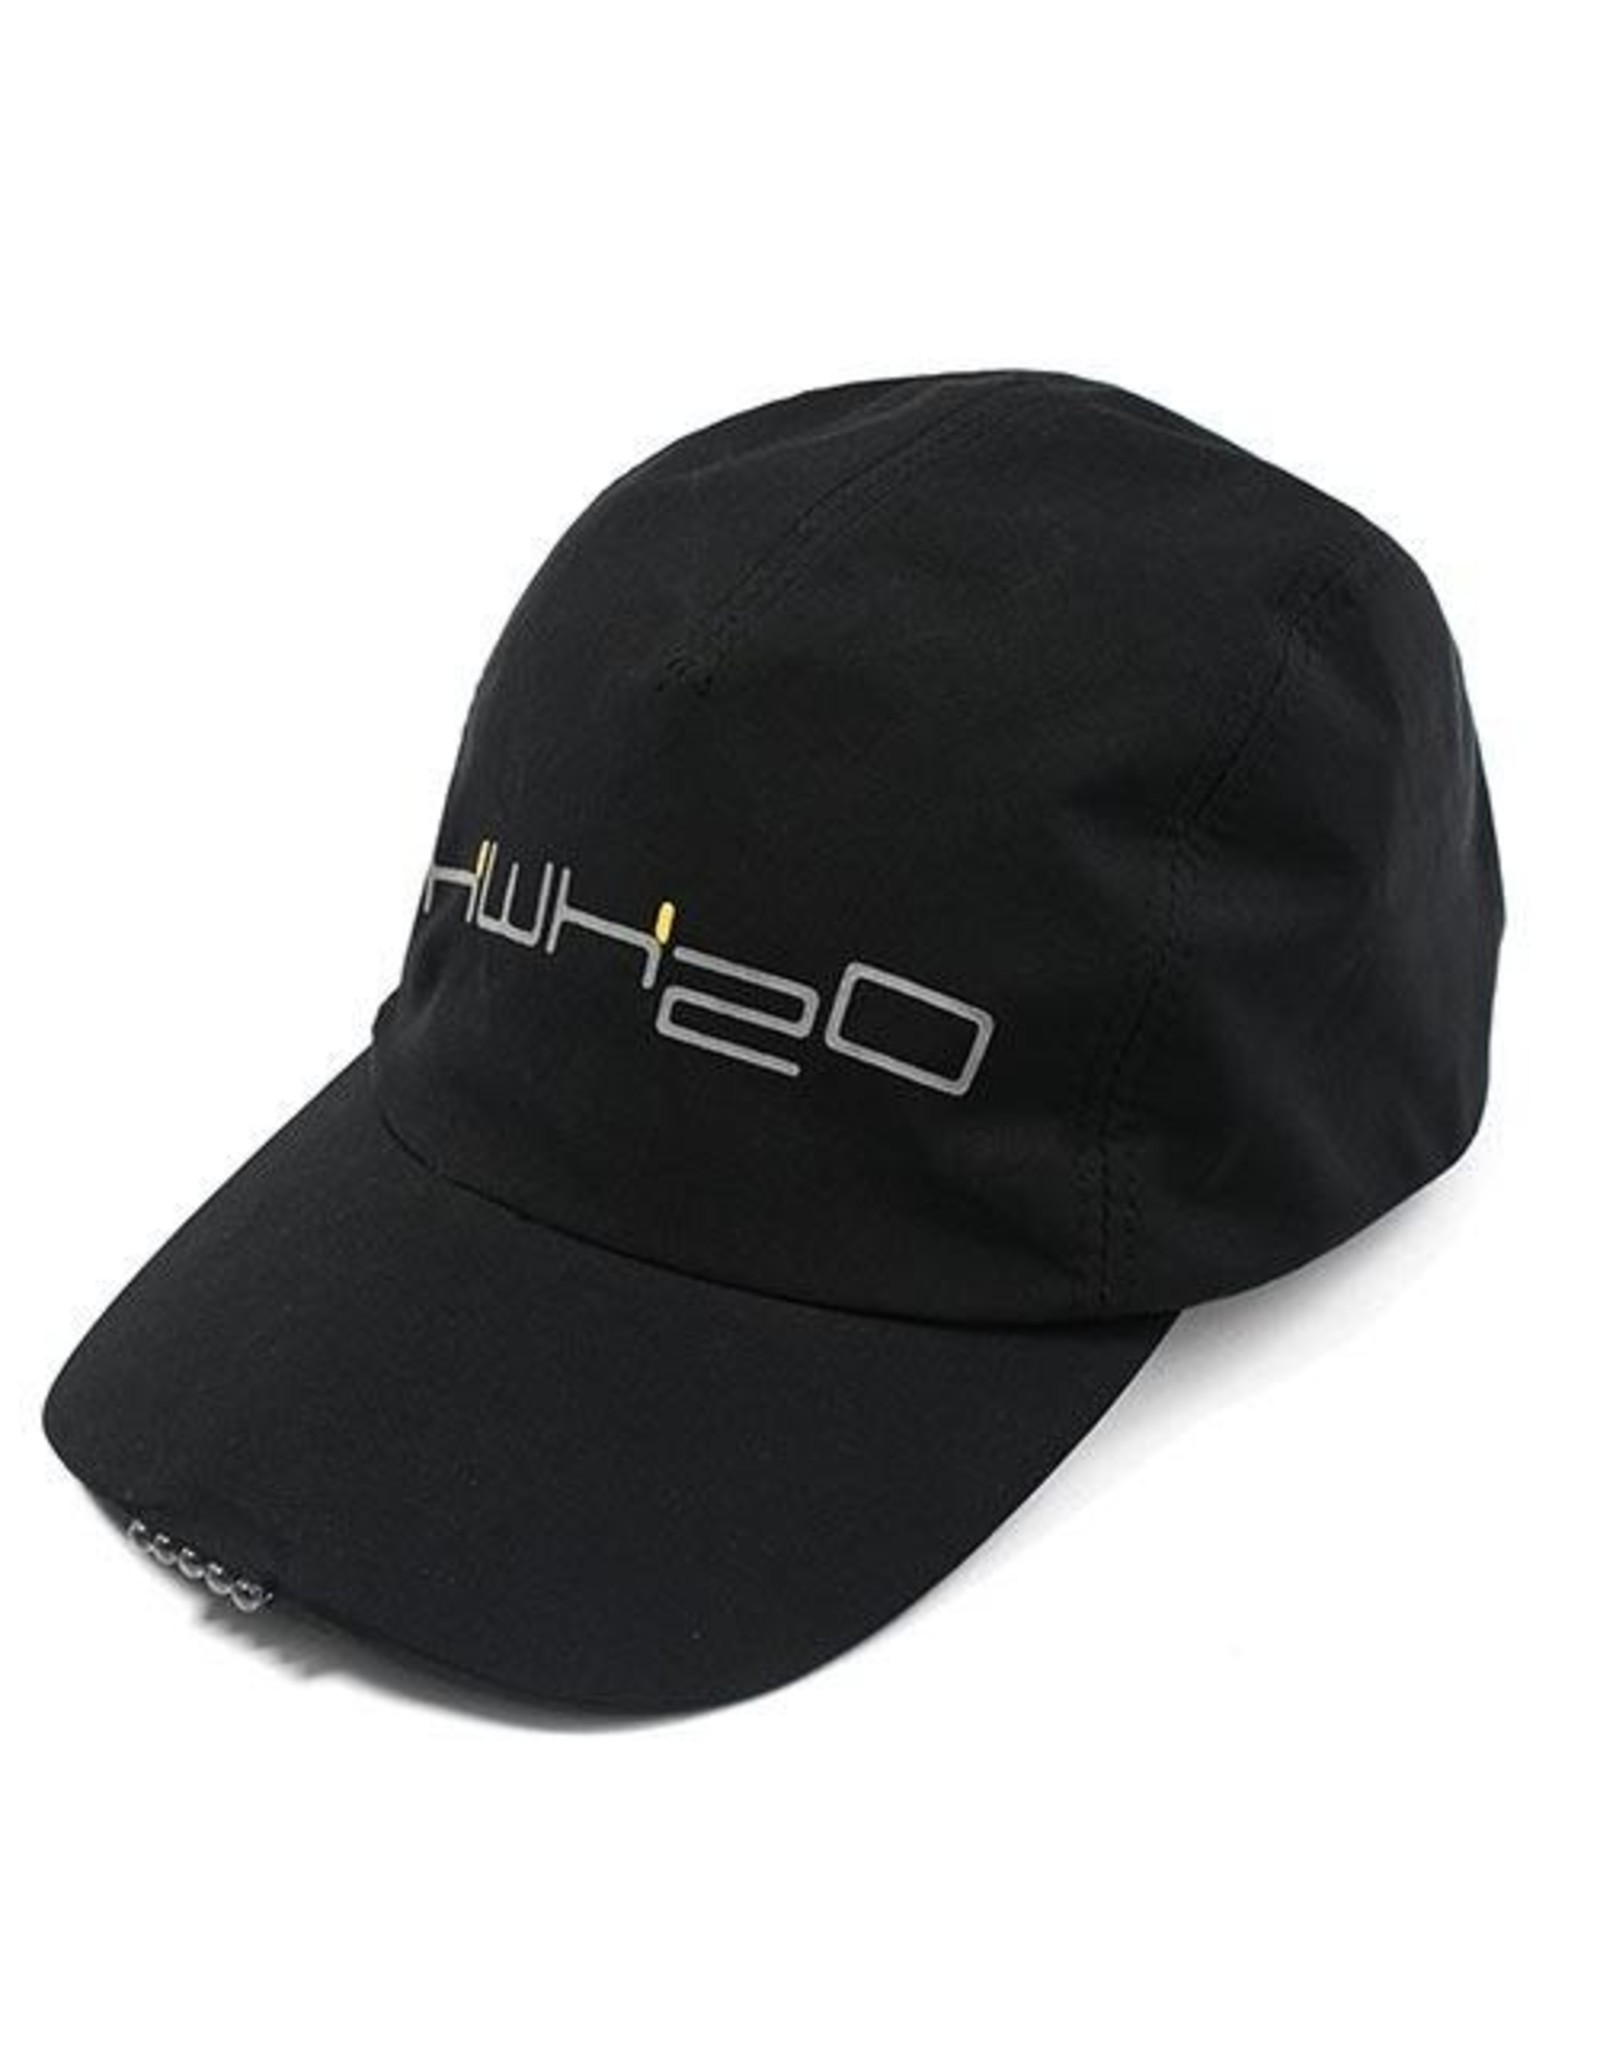 HORSEWARE IRELAND H20 LED CAP